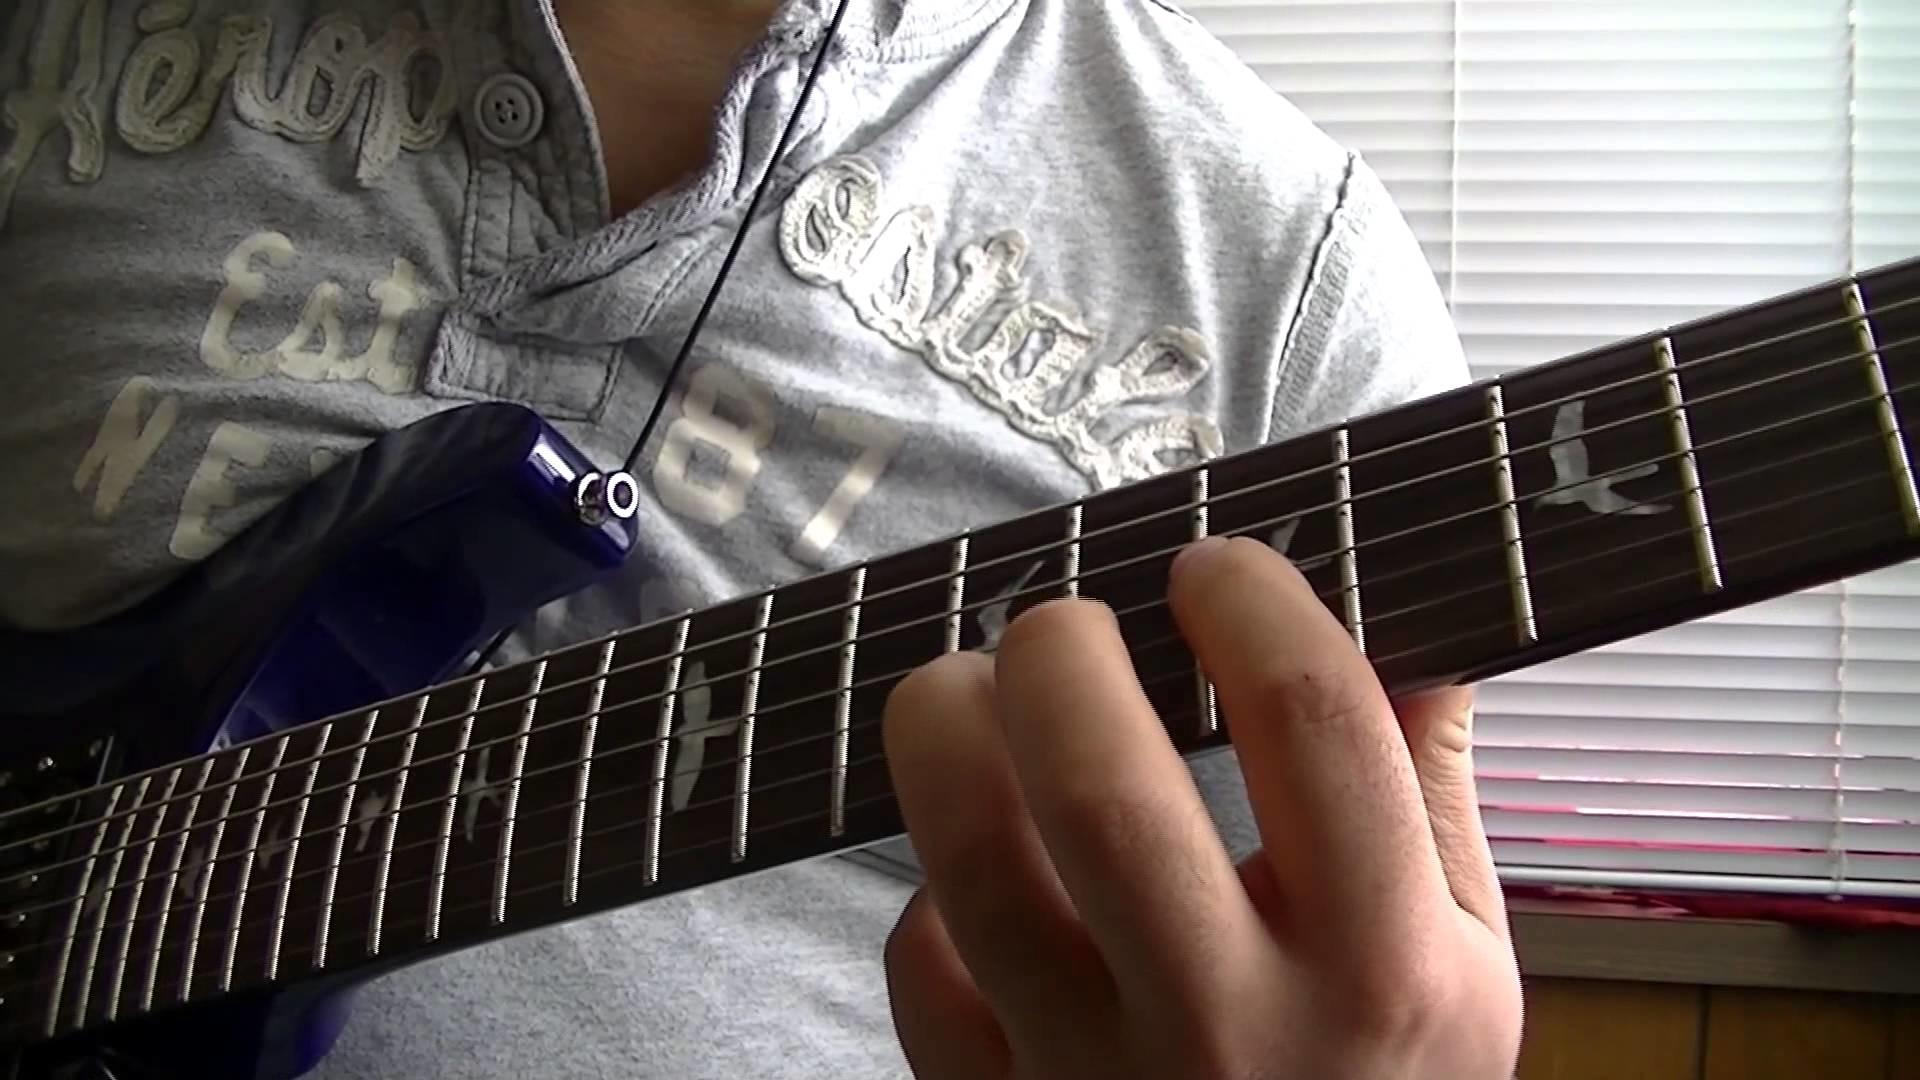 prs guitar wallpaper hd 1080p 52 images